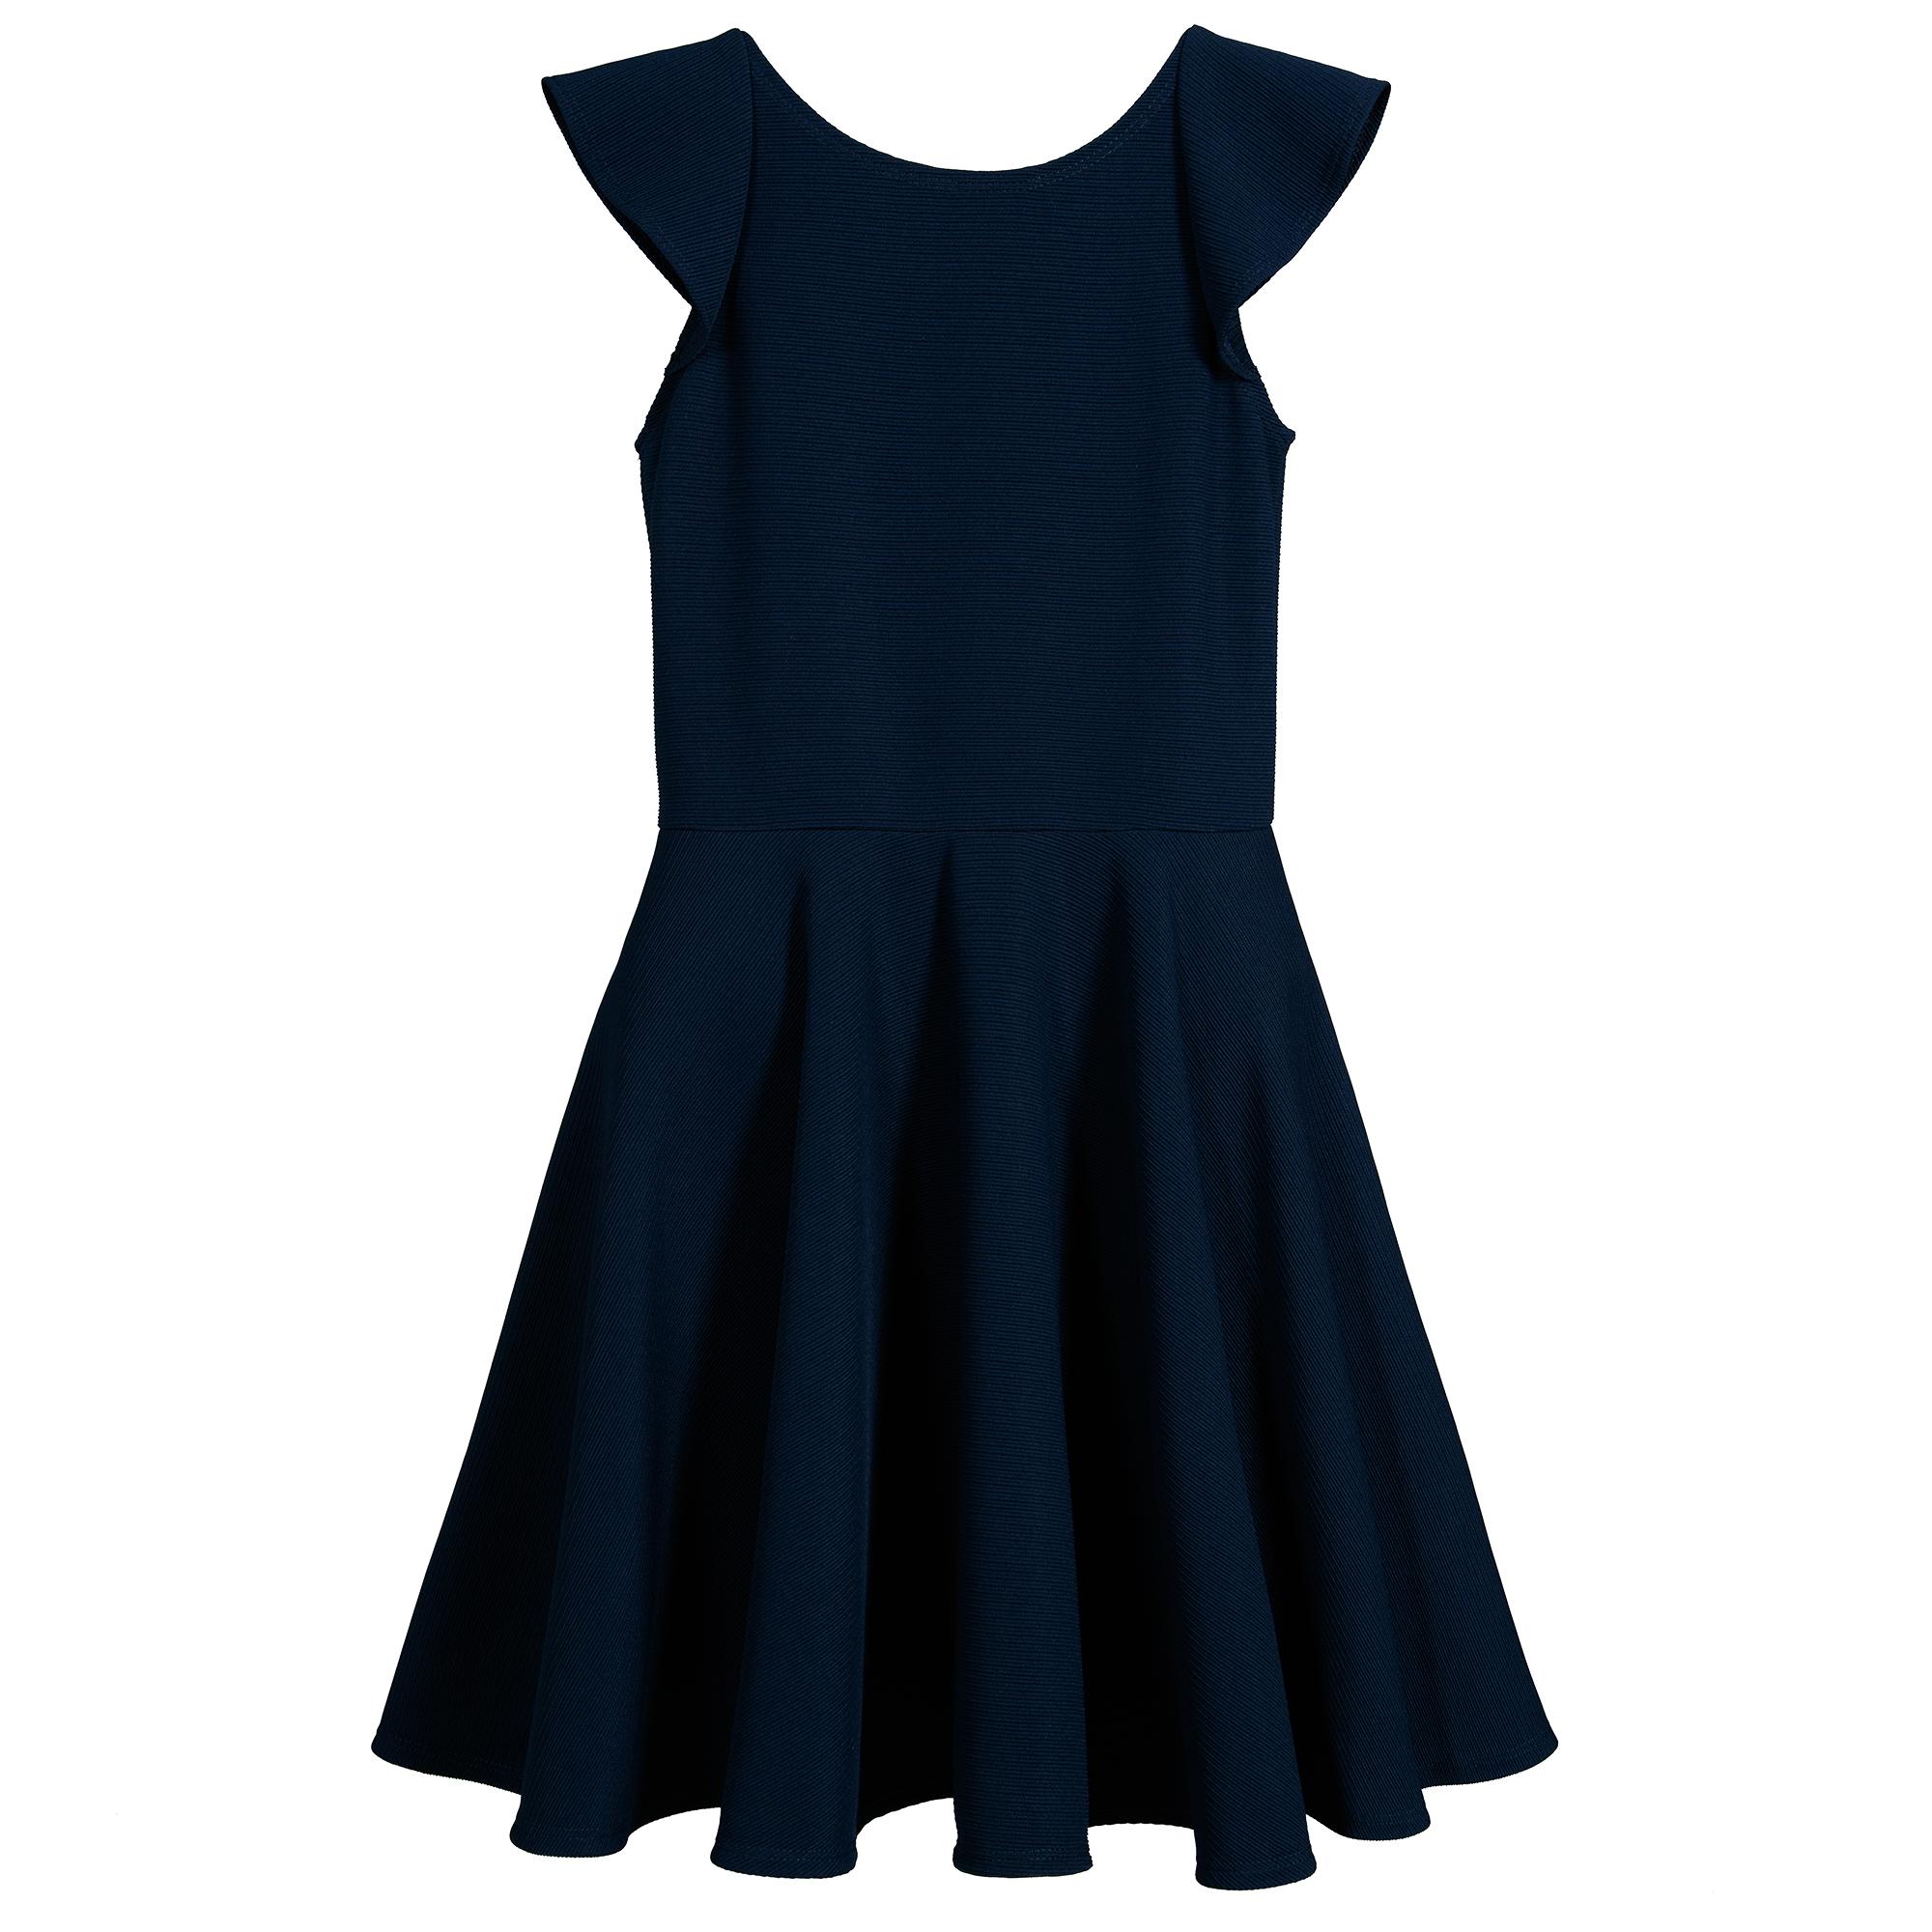 David Charles   Girls Blue Ruffle Dress   Childrensalon Outlet